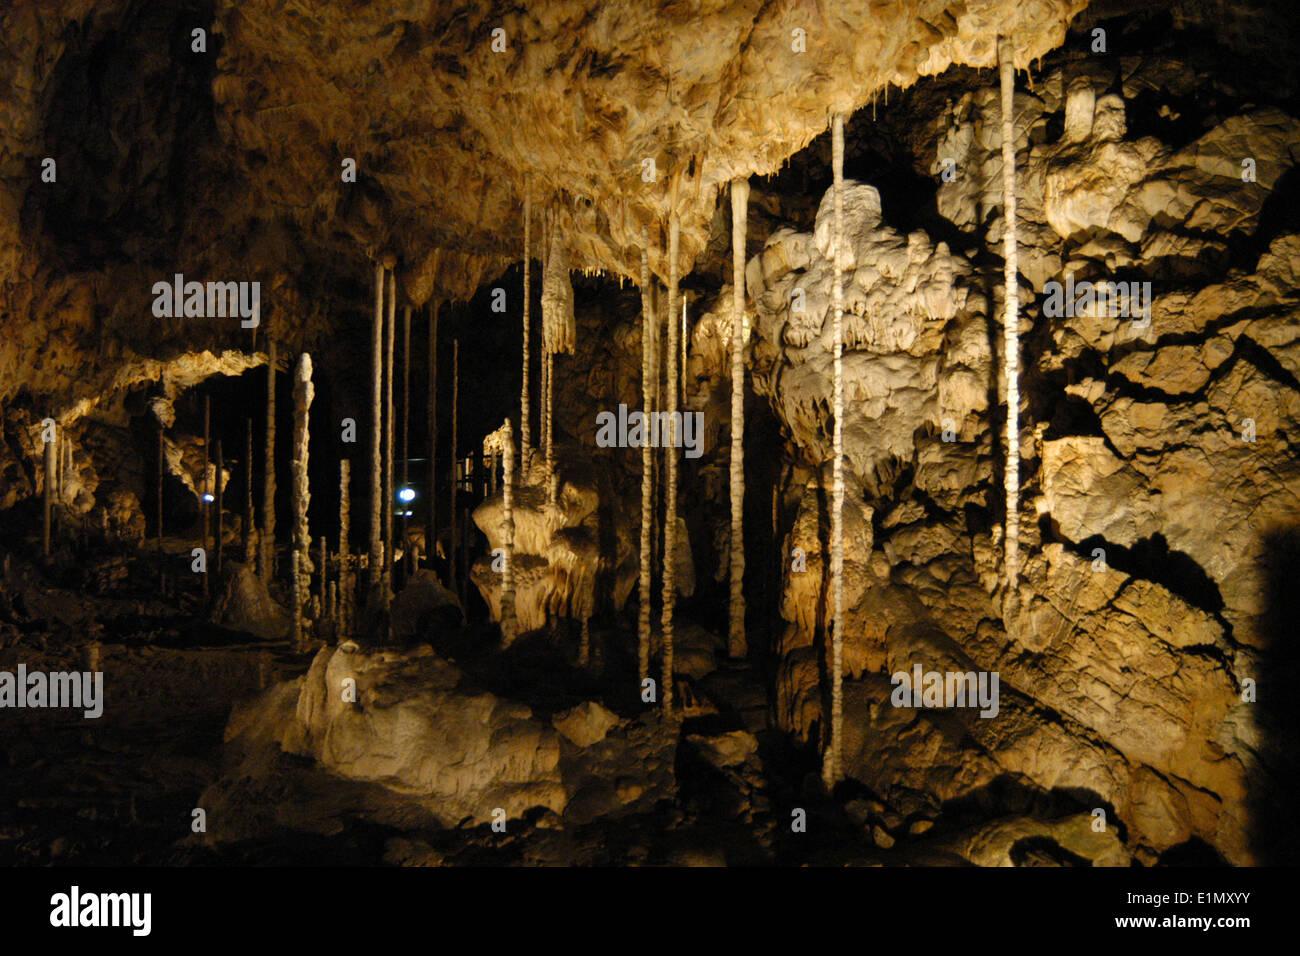 The Bamboo Wood in the Catherine's Cave (Katerinska Cave) in the Moravian Karst (Moravsky Kras) Area near Brno, Czech Republic.  - Stock Image